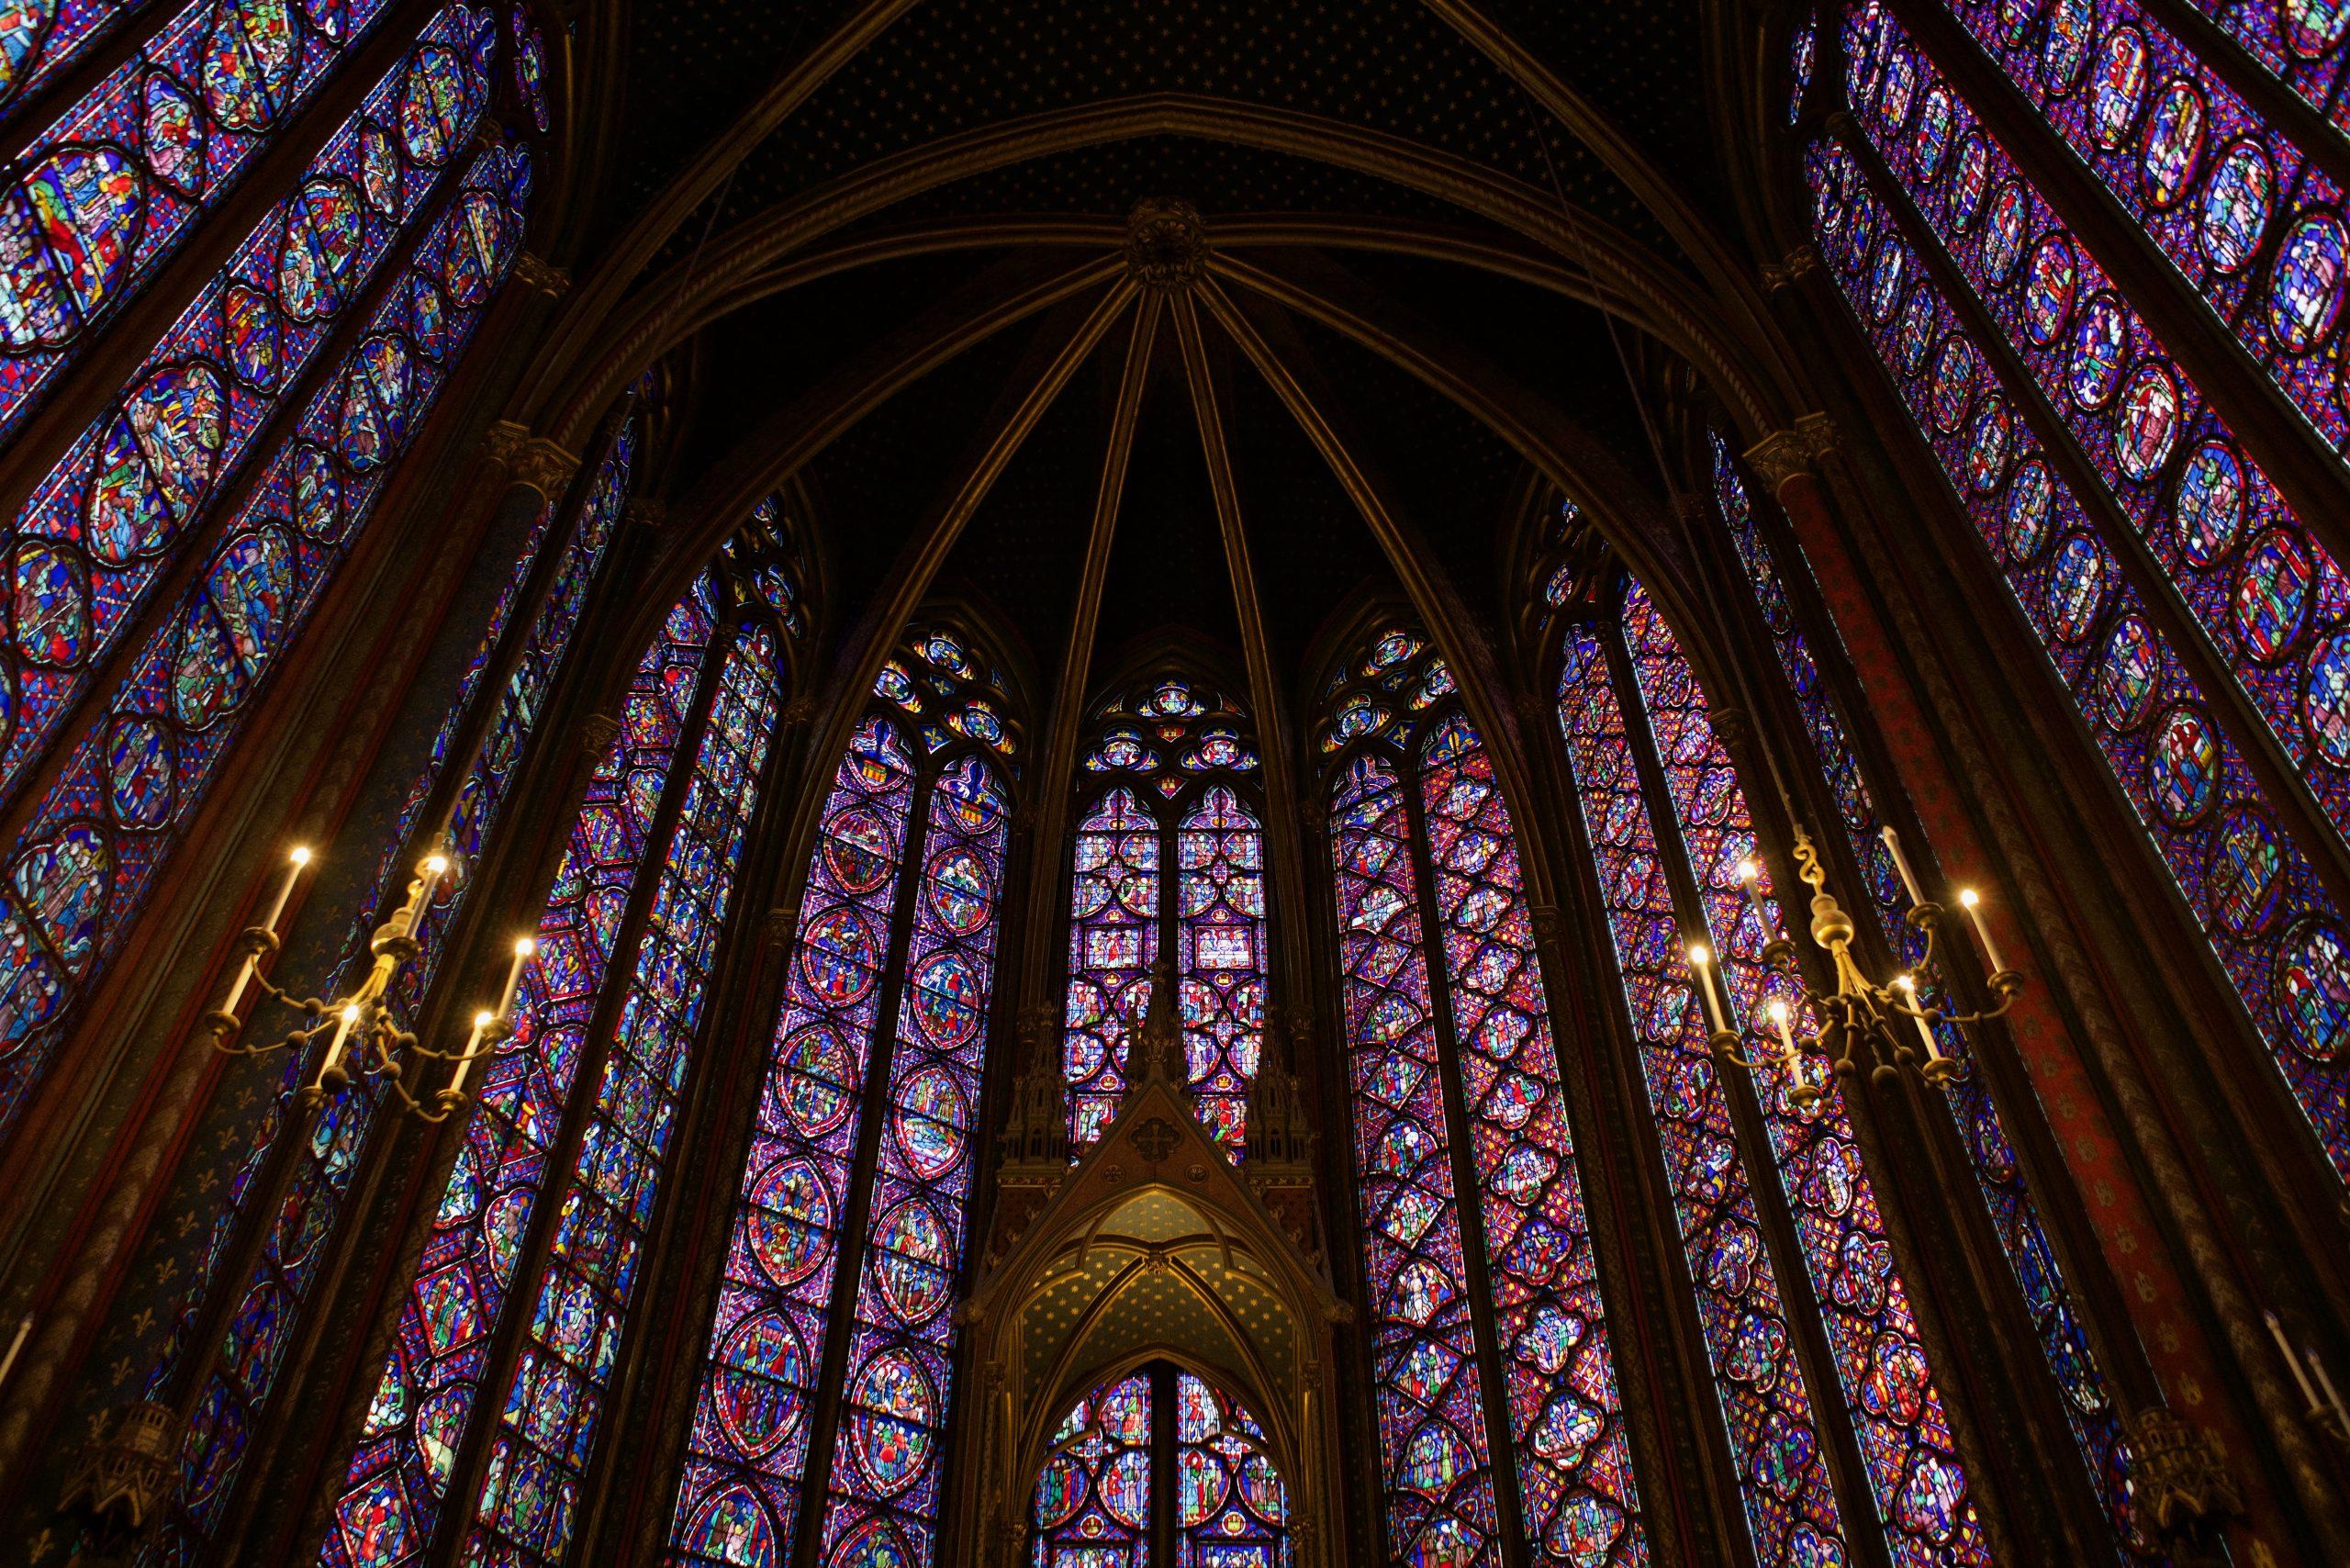 Extravagant-interior-of-the-Sainte-Chapelle